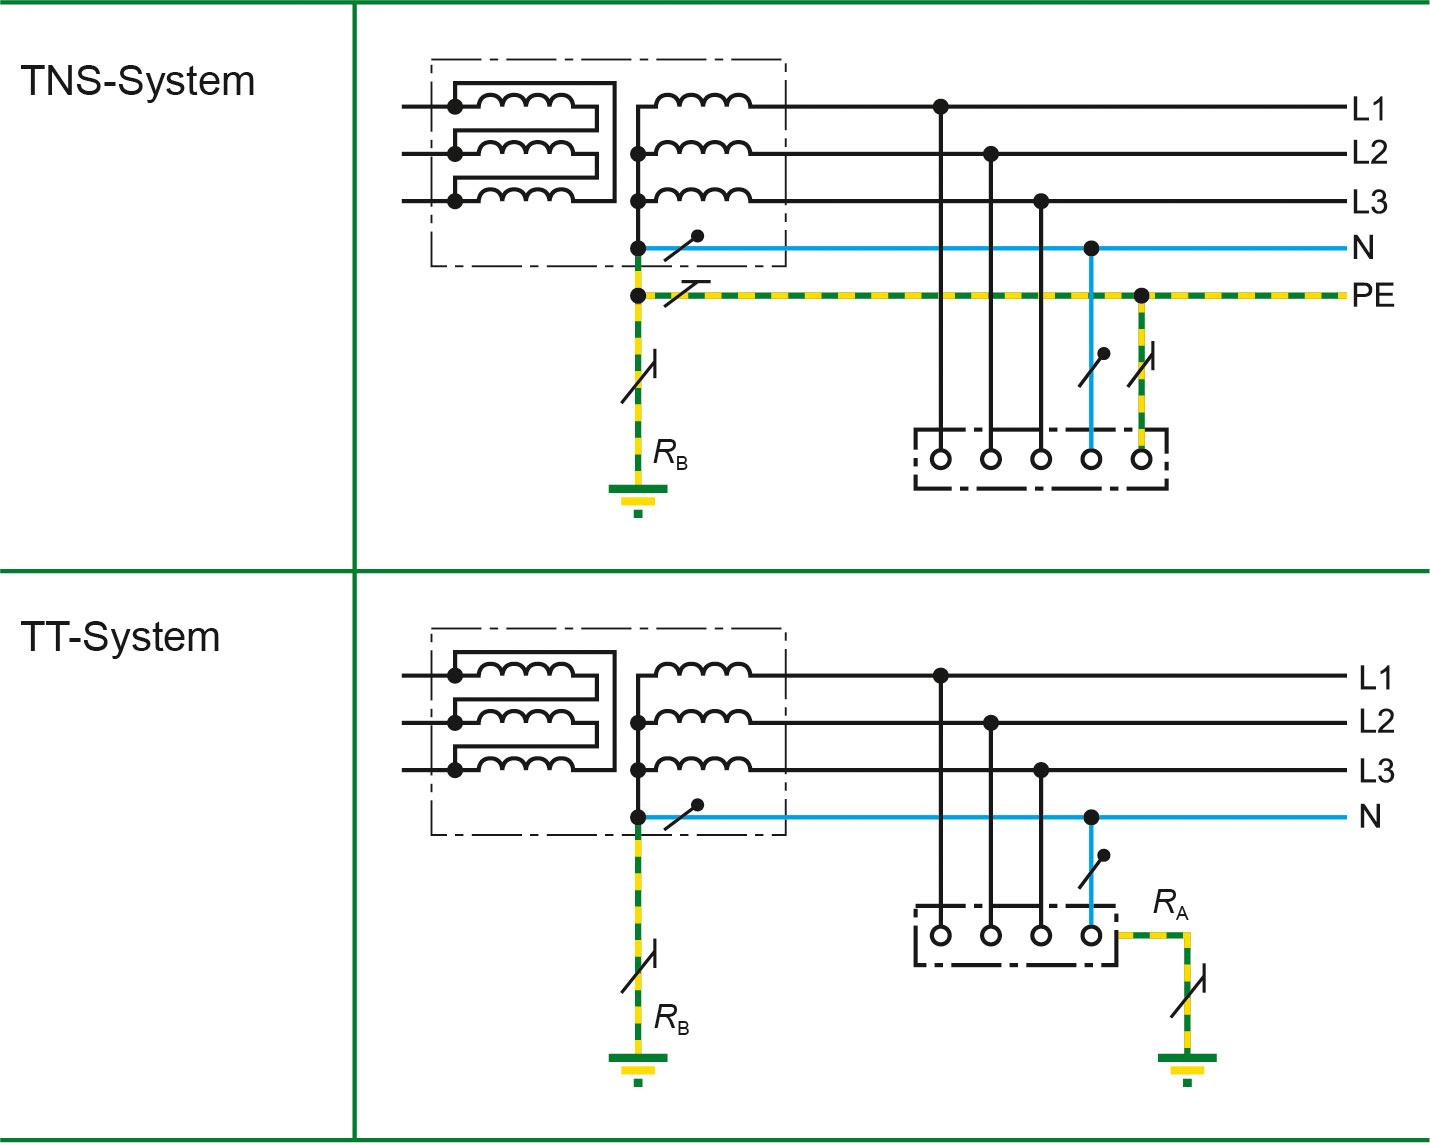 Sistema TN-S-/TT